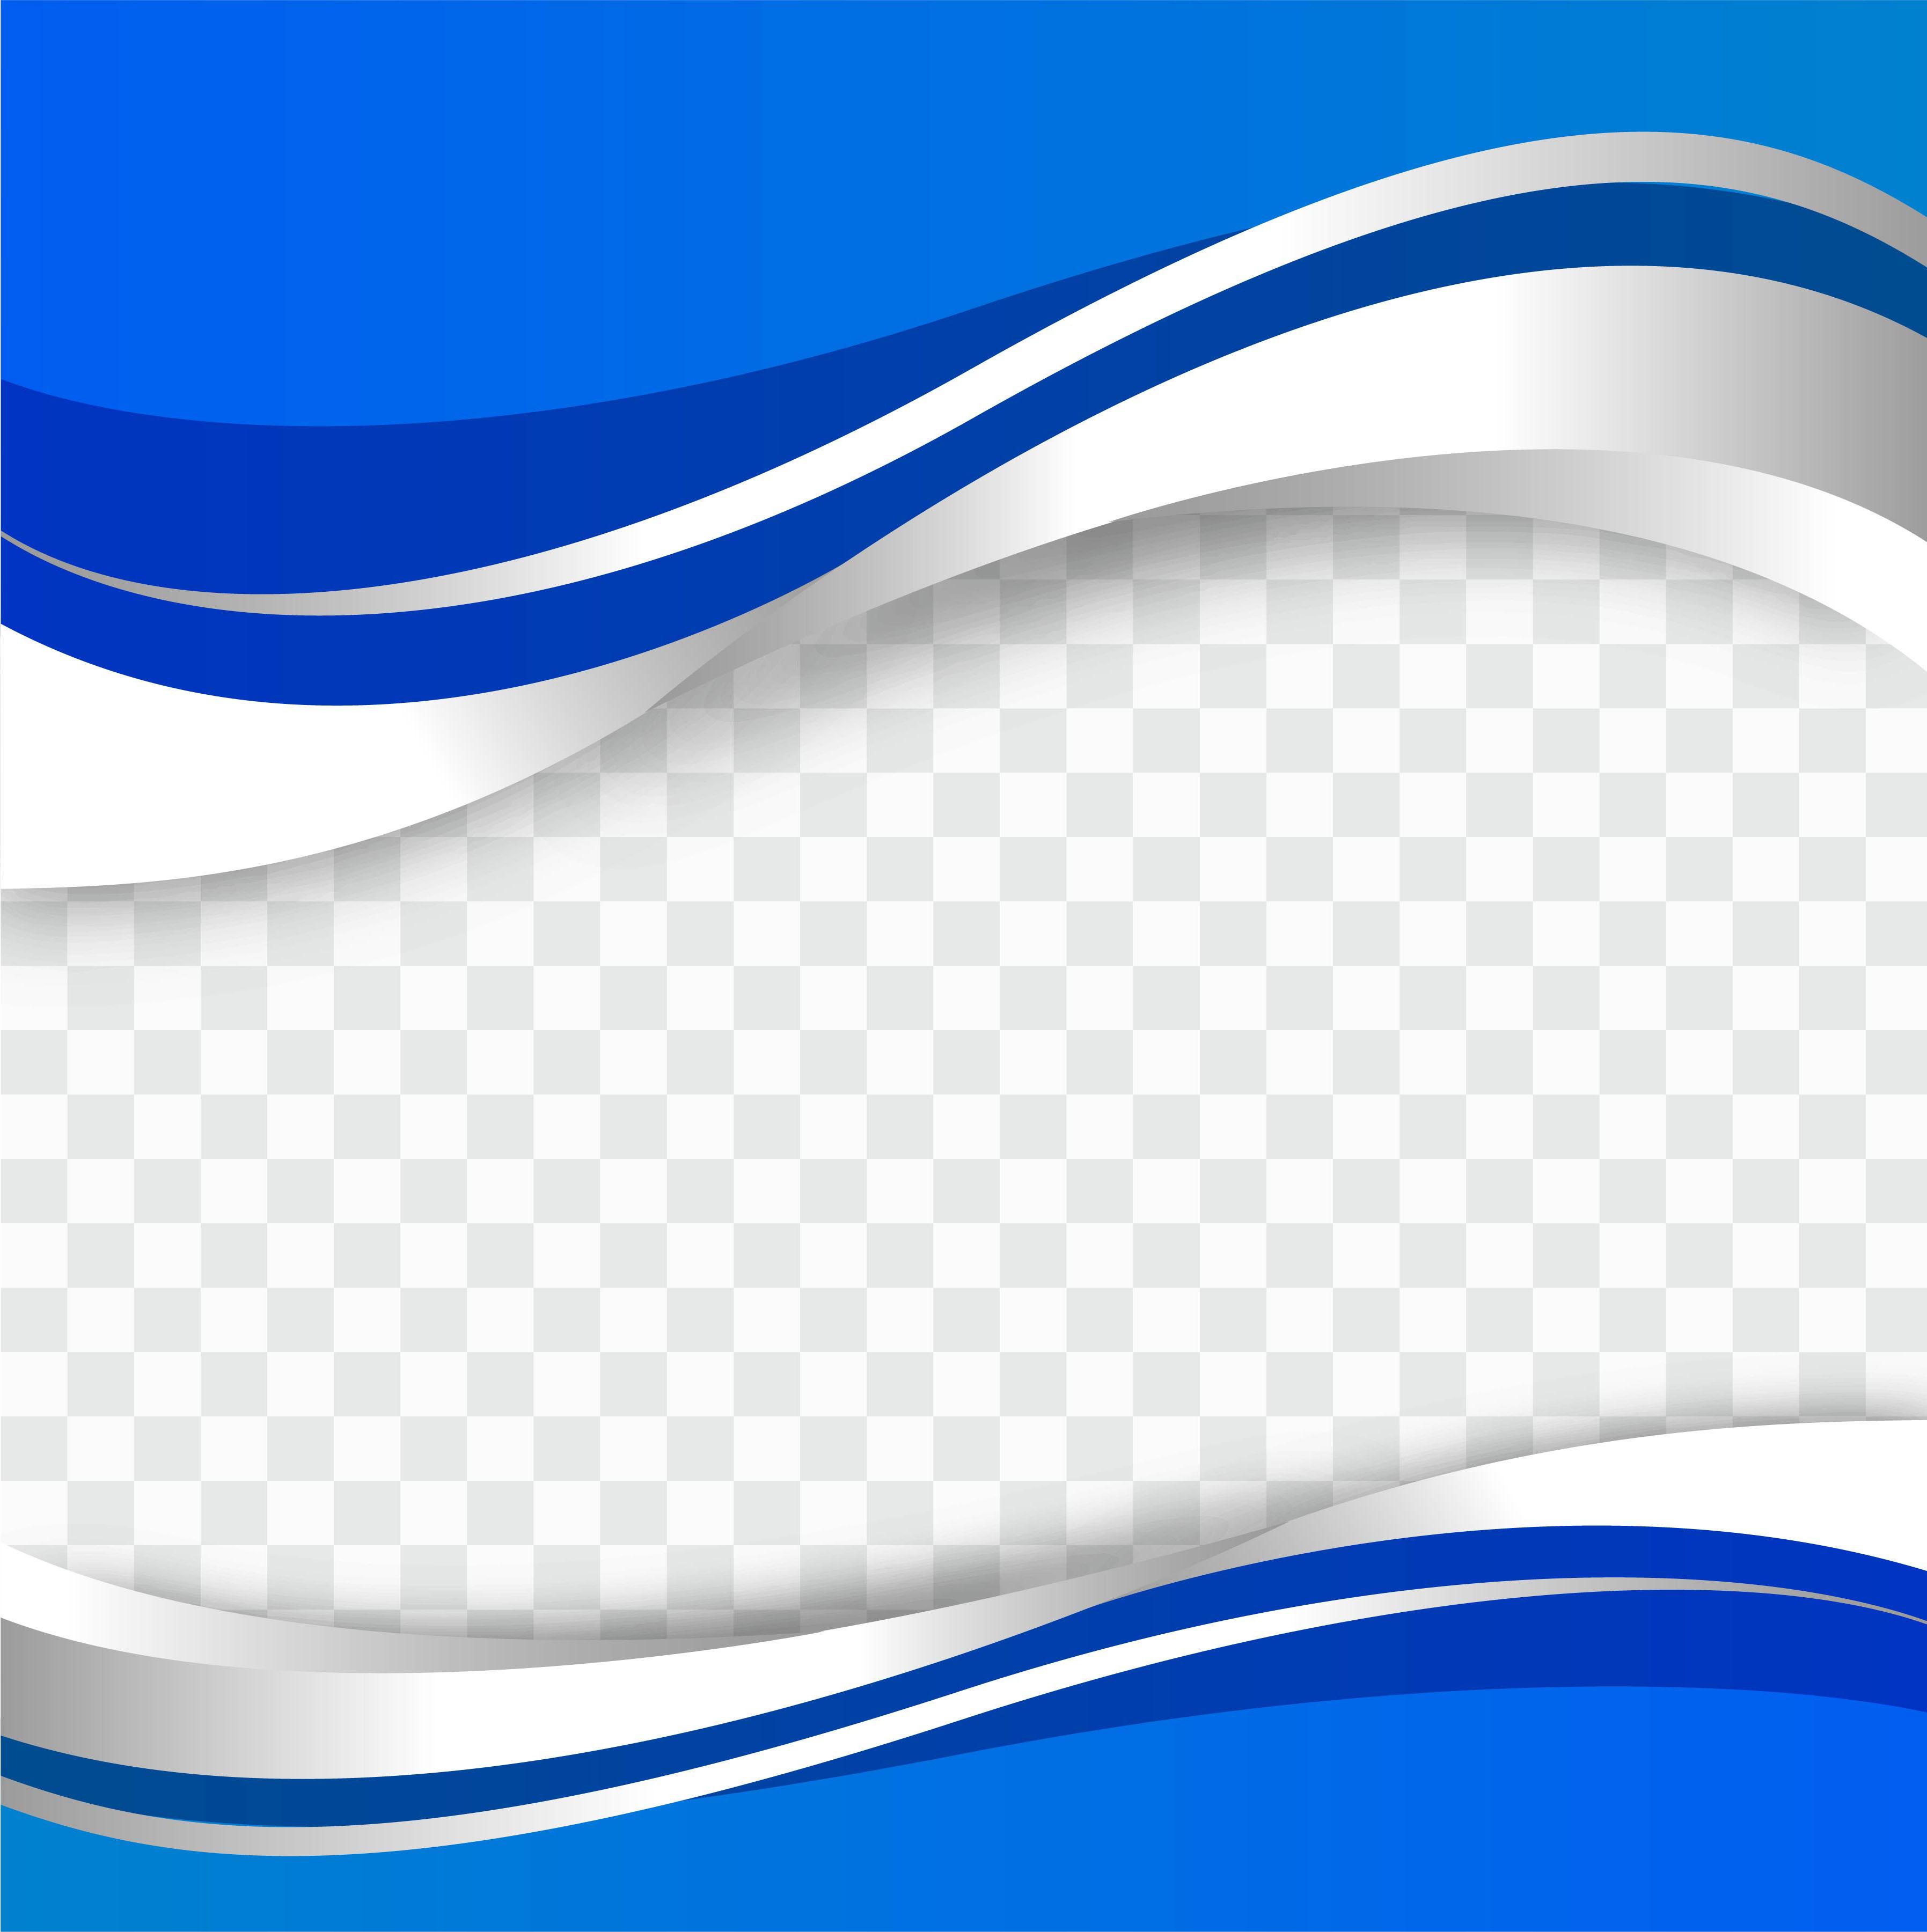 Abstract stylish elegant blue wave background vector ...